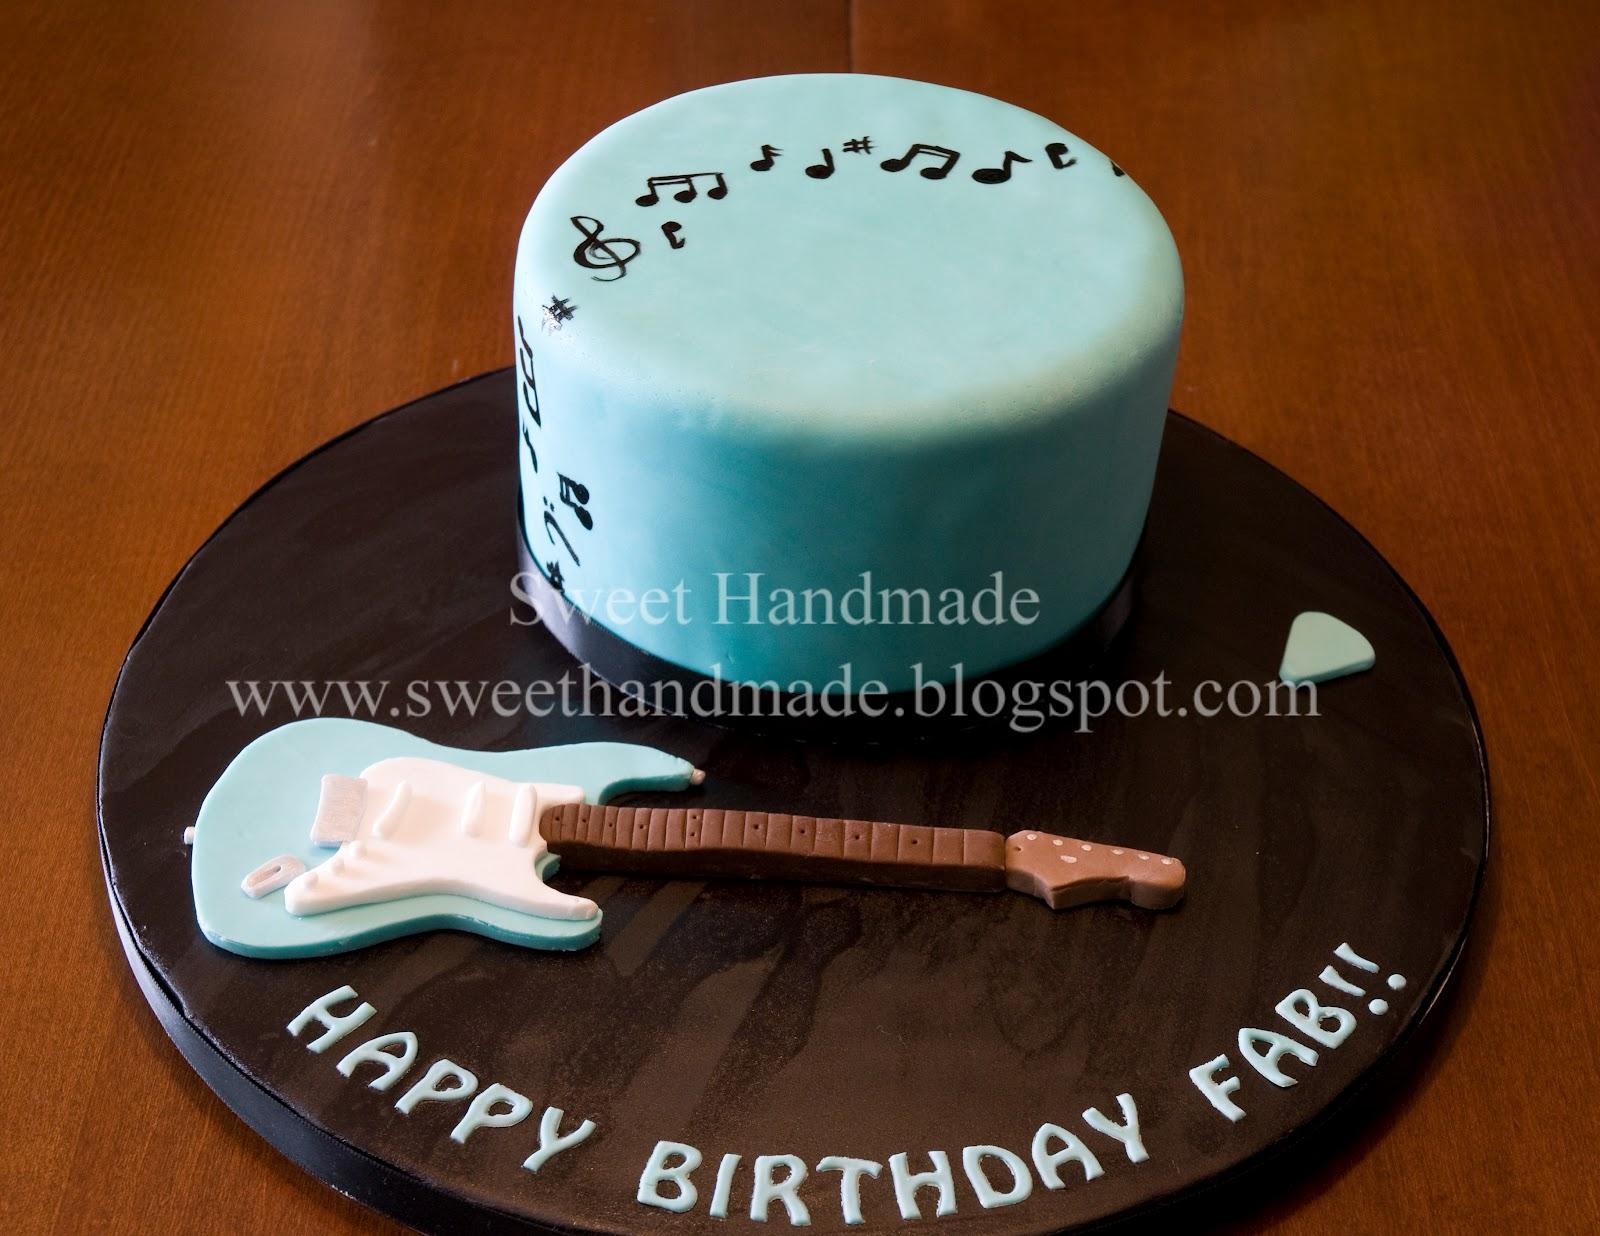 Sweet Handmade Cookies 40th Birthday Guitar Cake